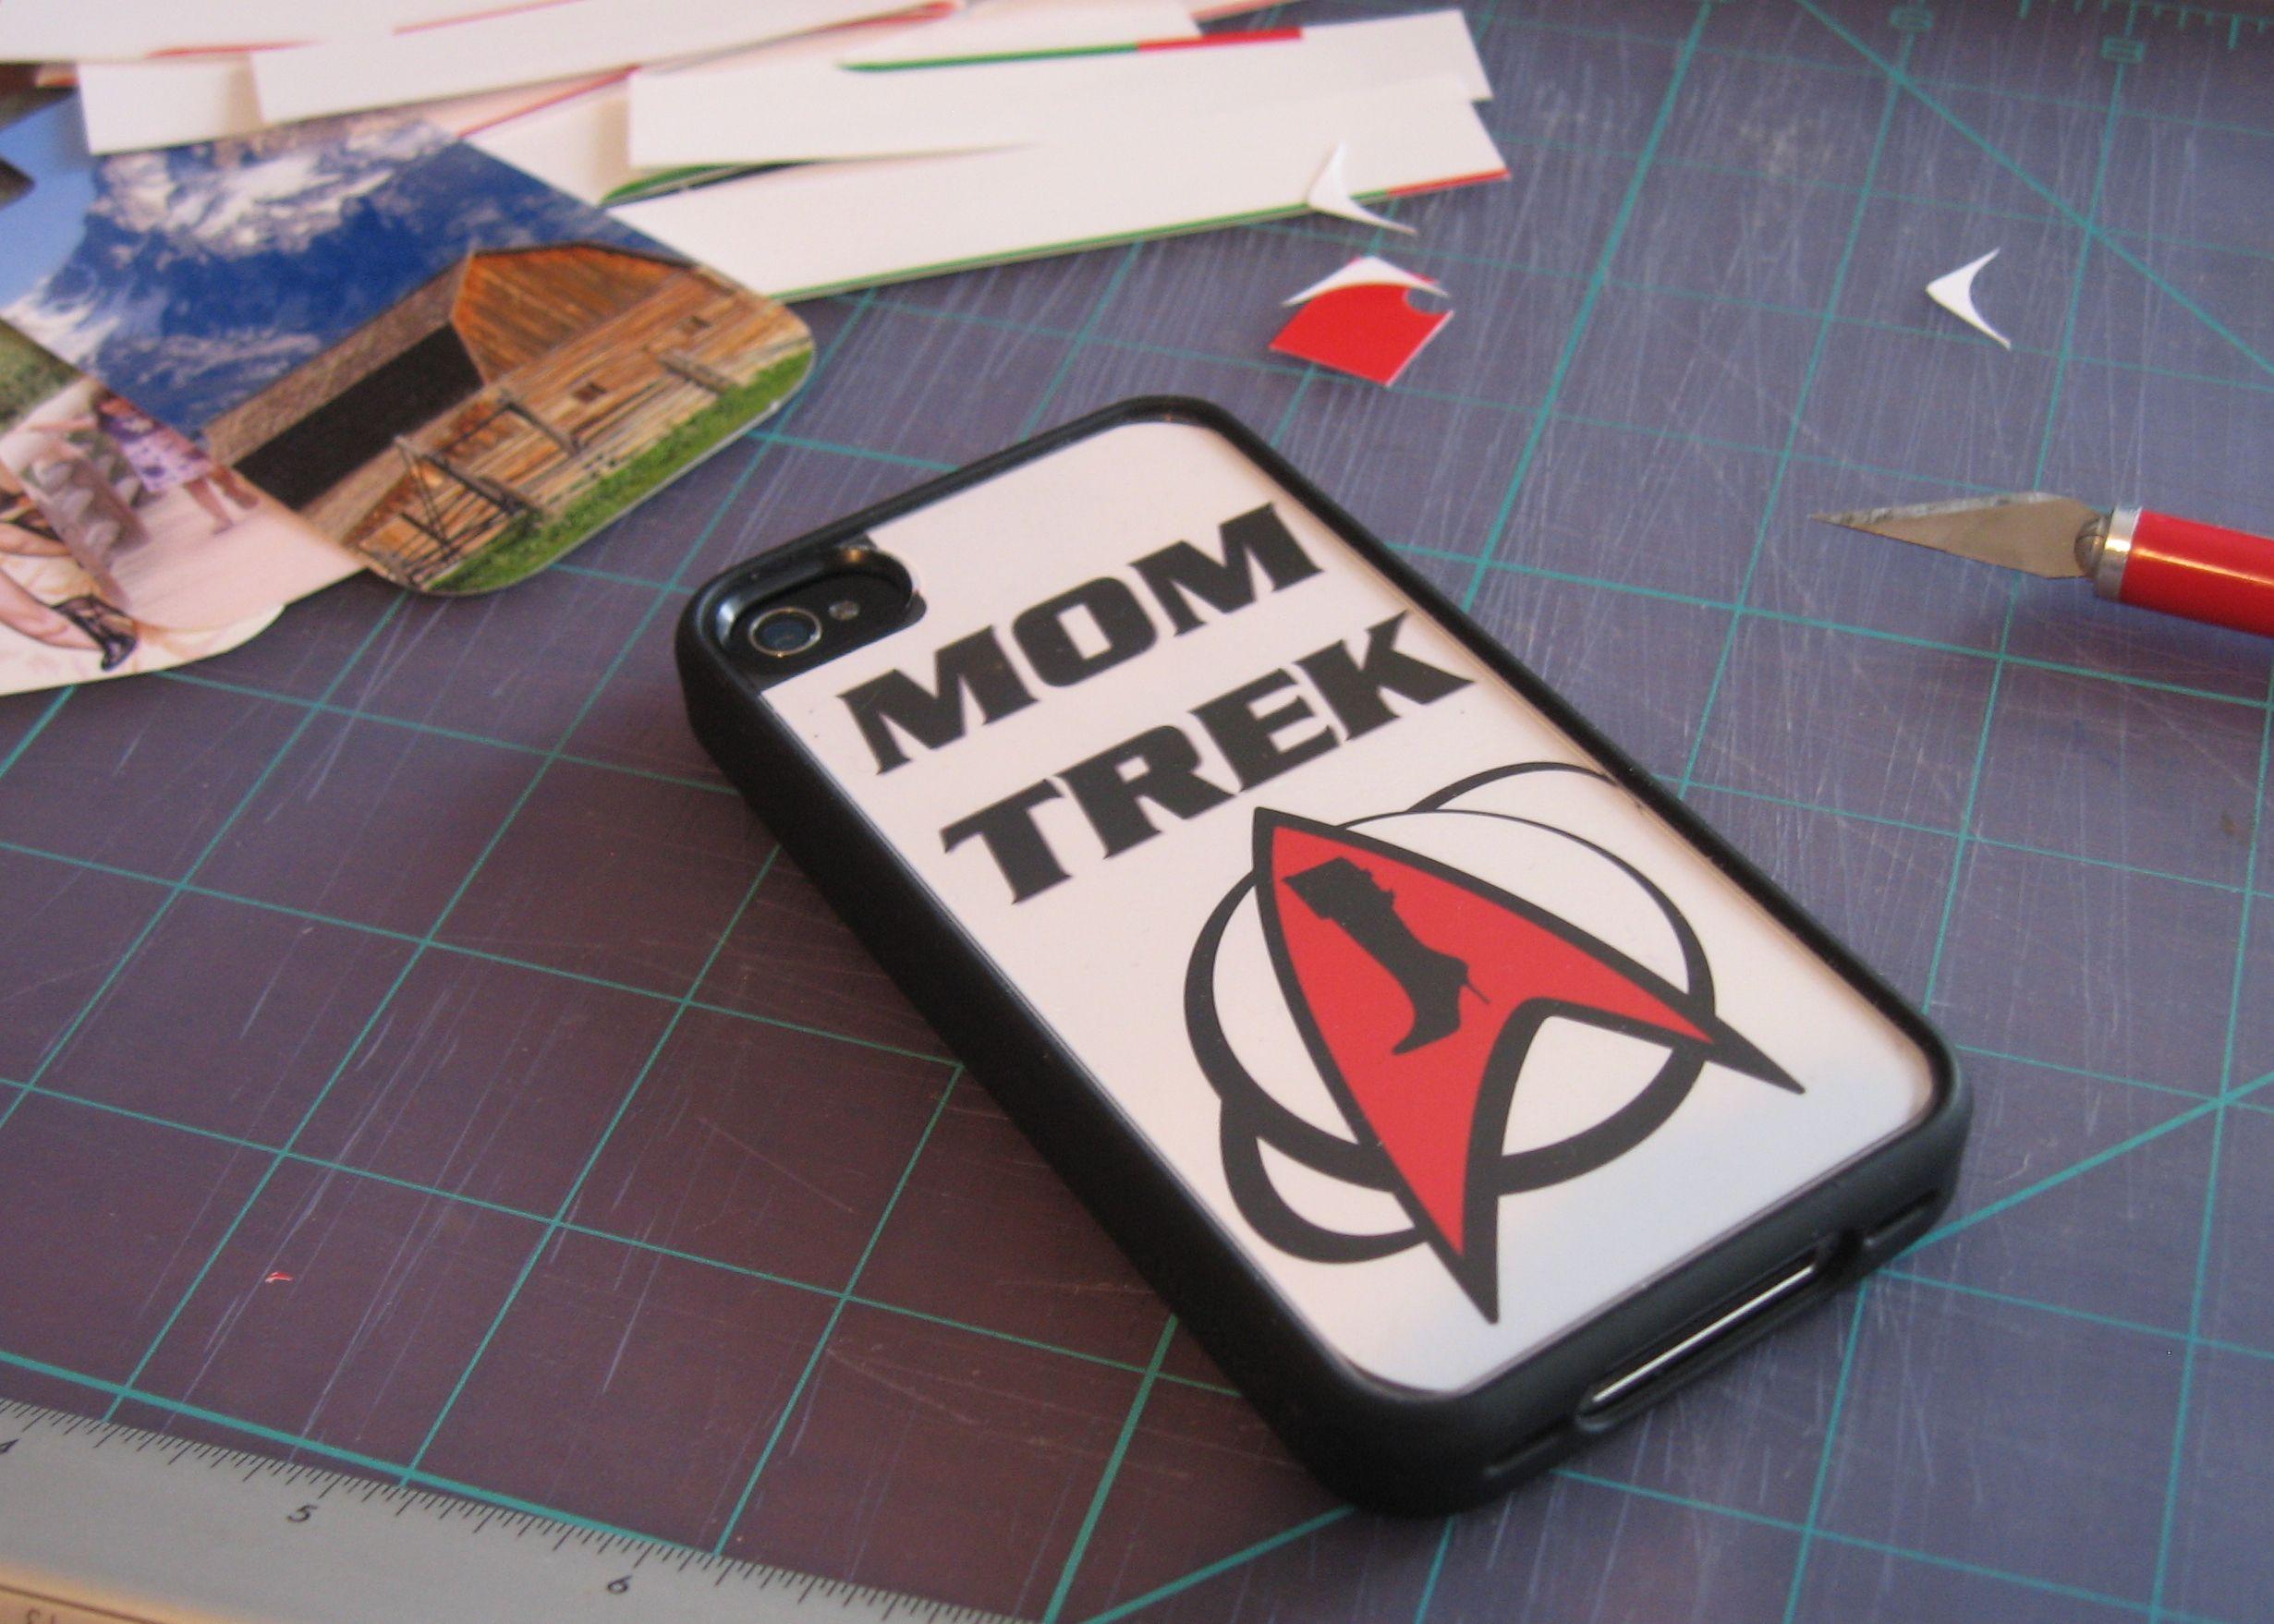 I Do Love Having Loyal Crew Members Ino Itall Has Created A Custom Iphone Skin Iphone Skins Iphone Geeky